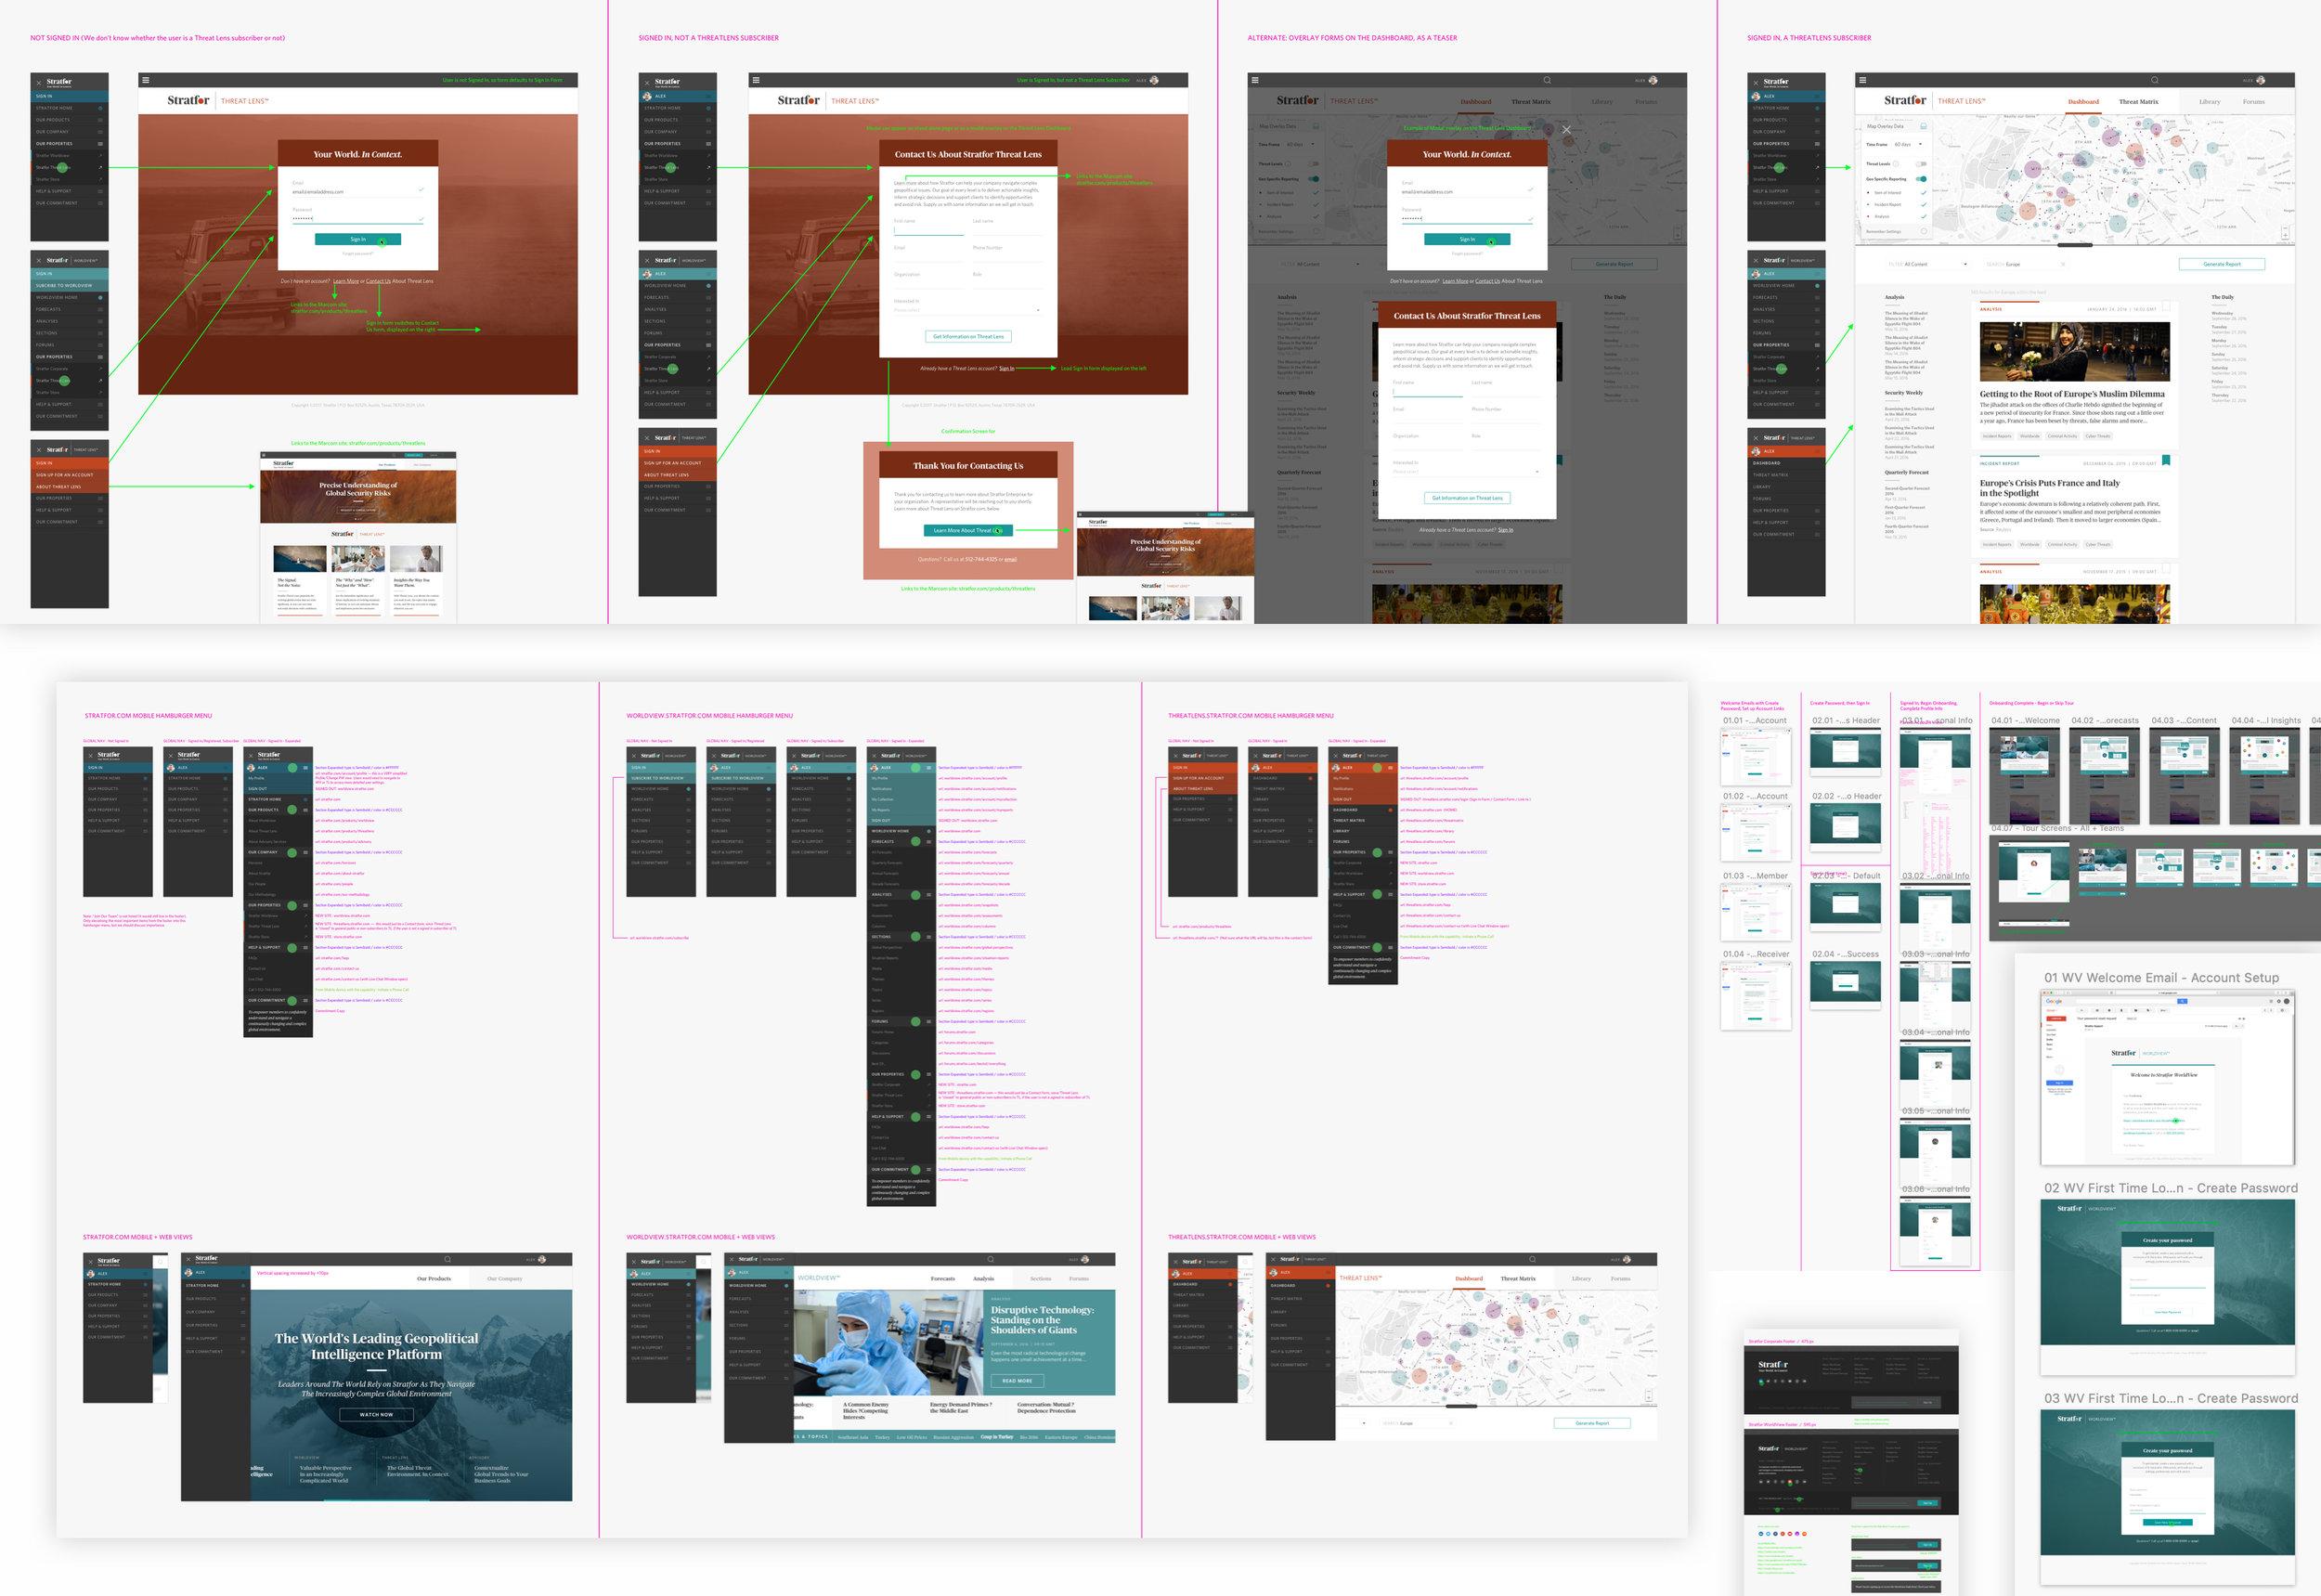 stratfor_process-flow_05@2x.jpg